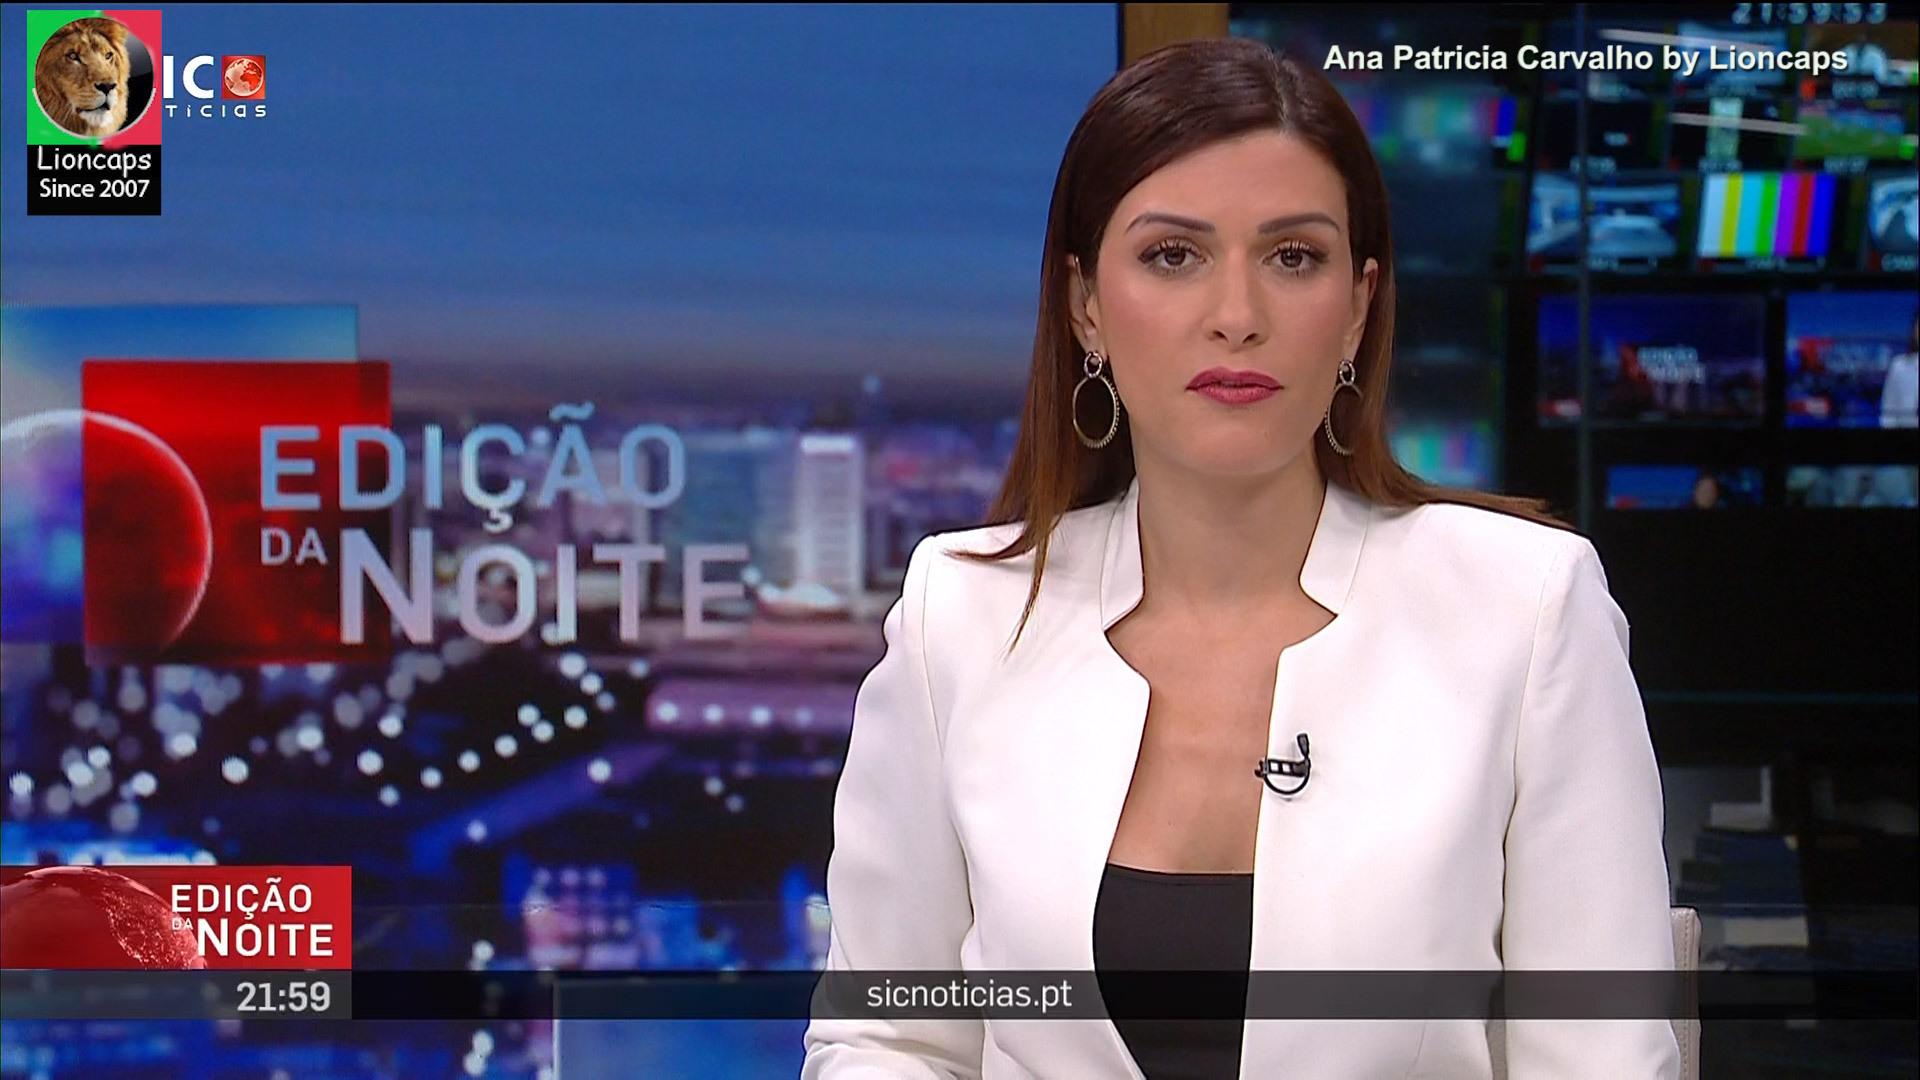 ana_patricia_carvalho_sicn_lioncaps_30_05_2021 (4).jpg